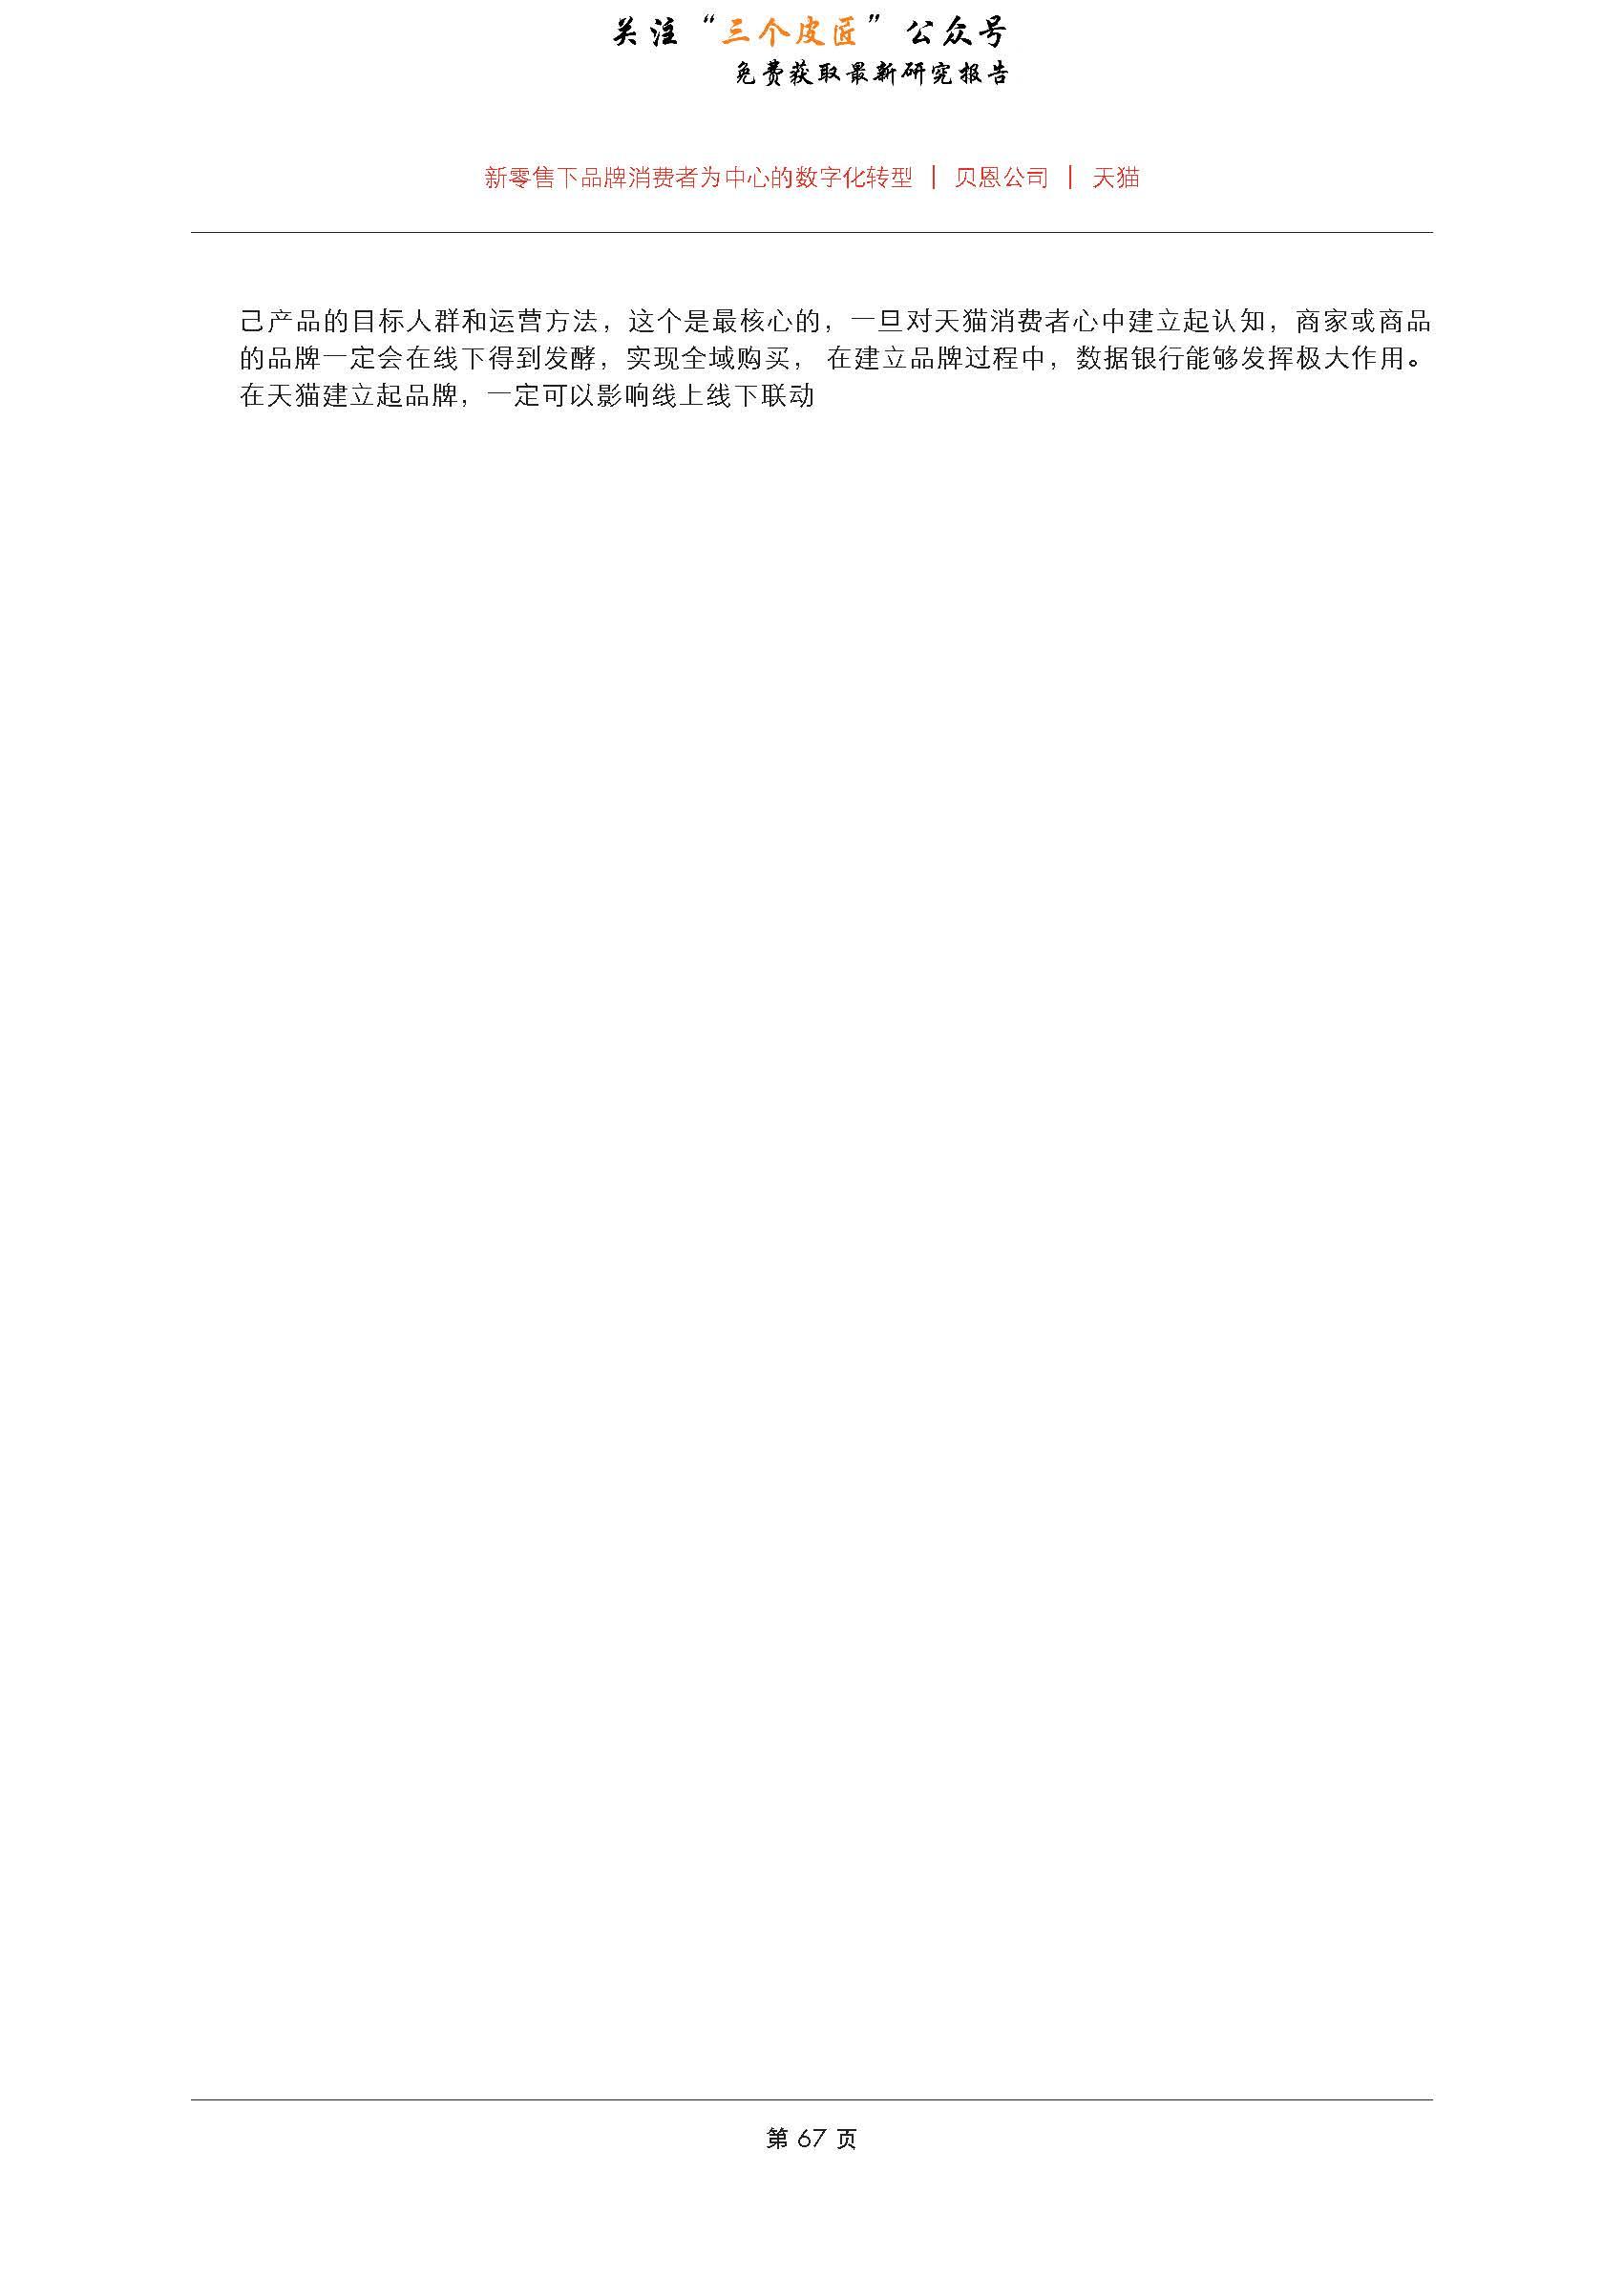 1_Page_69.jpg